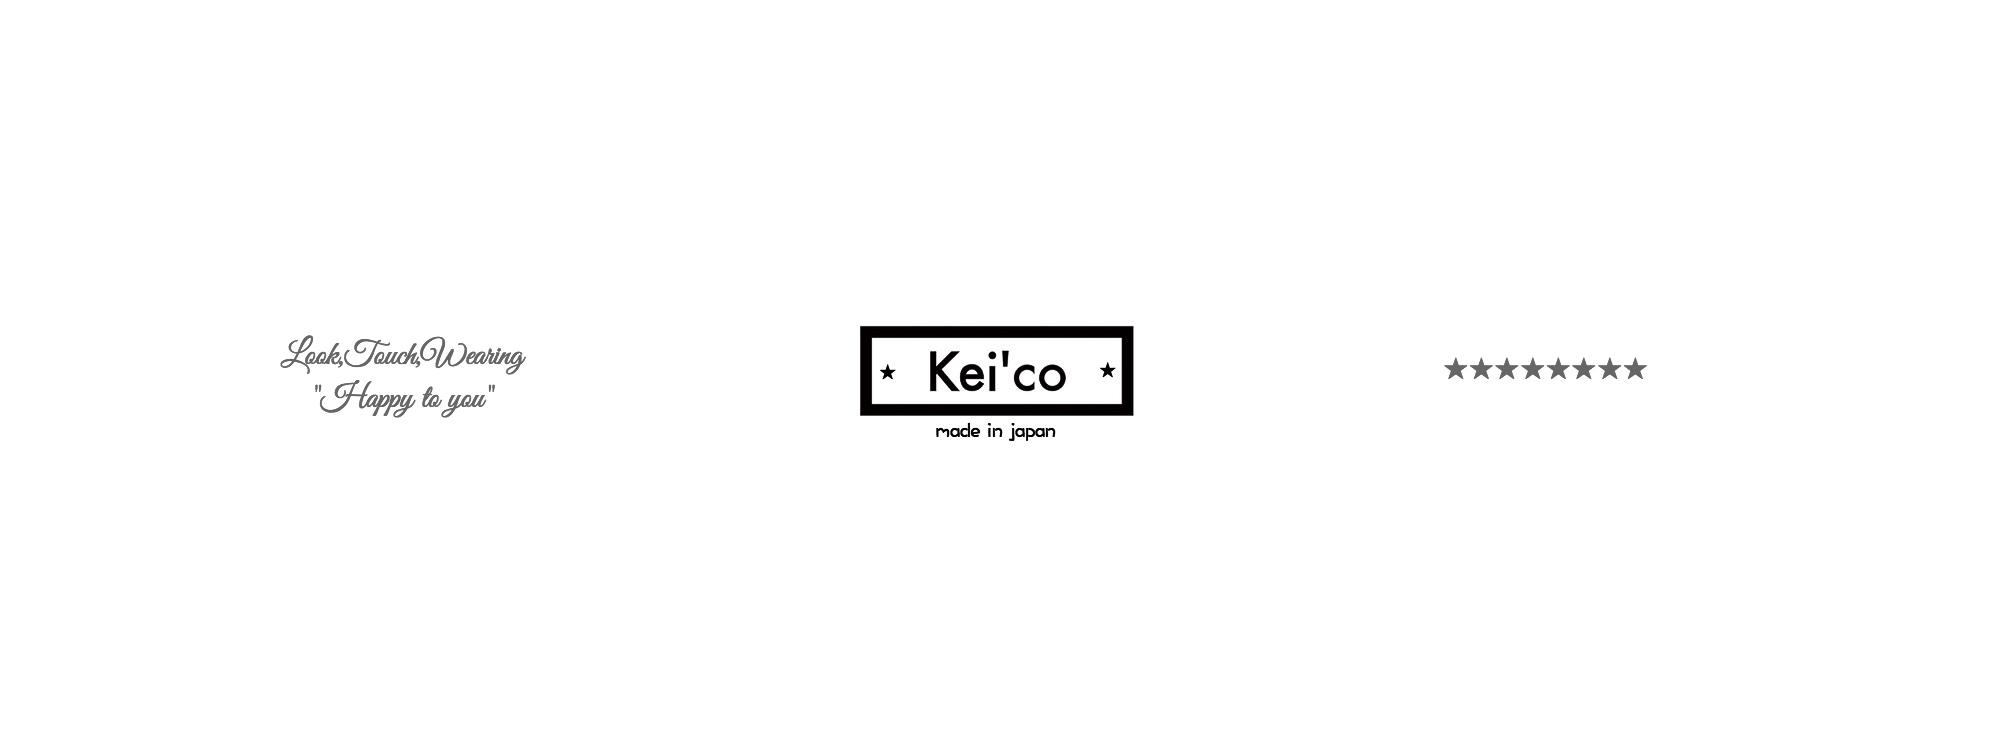 Kei'co